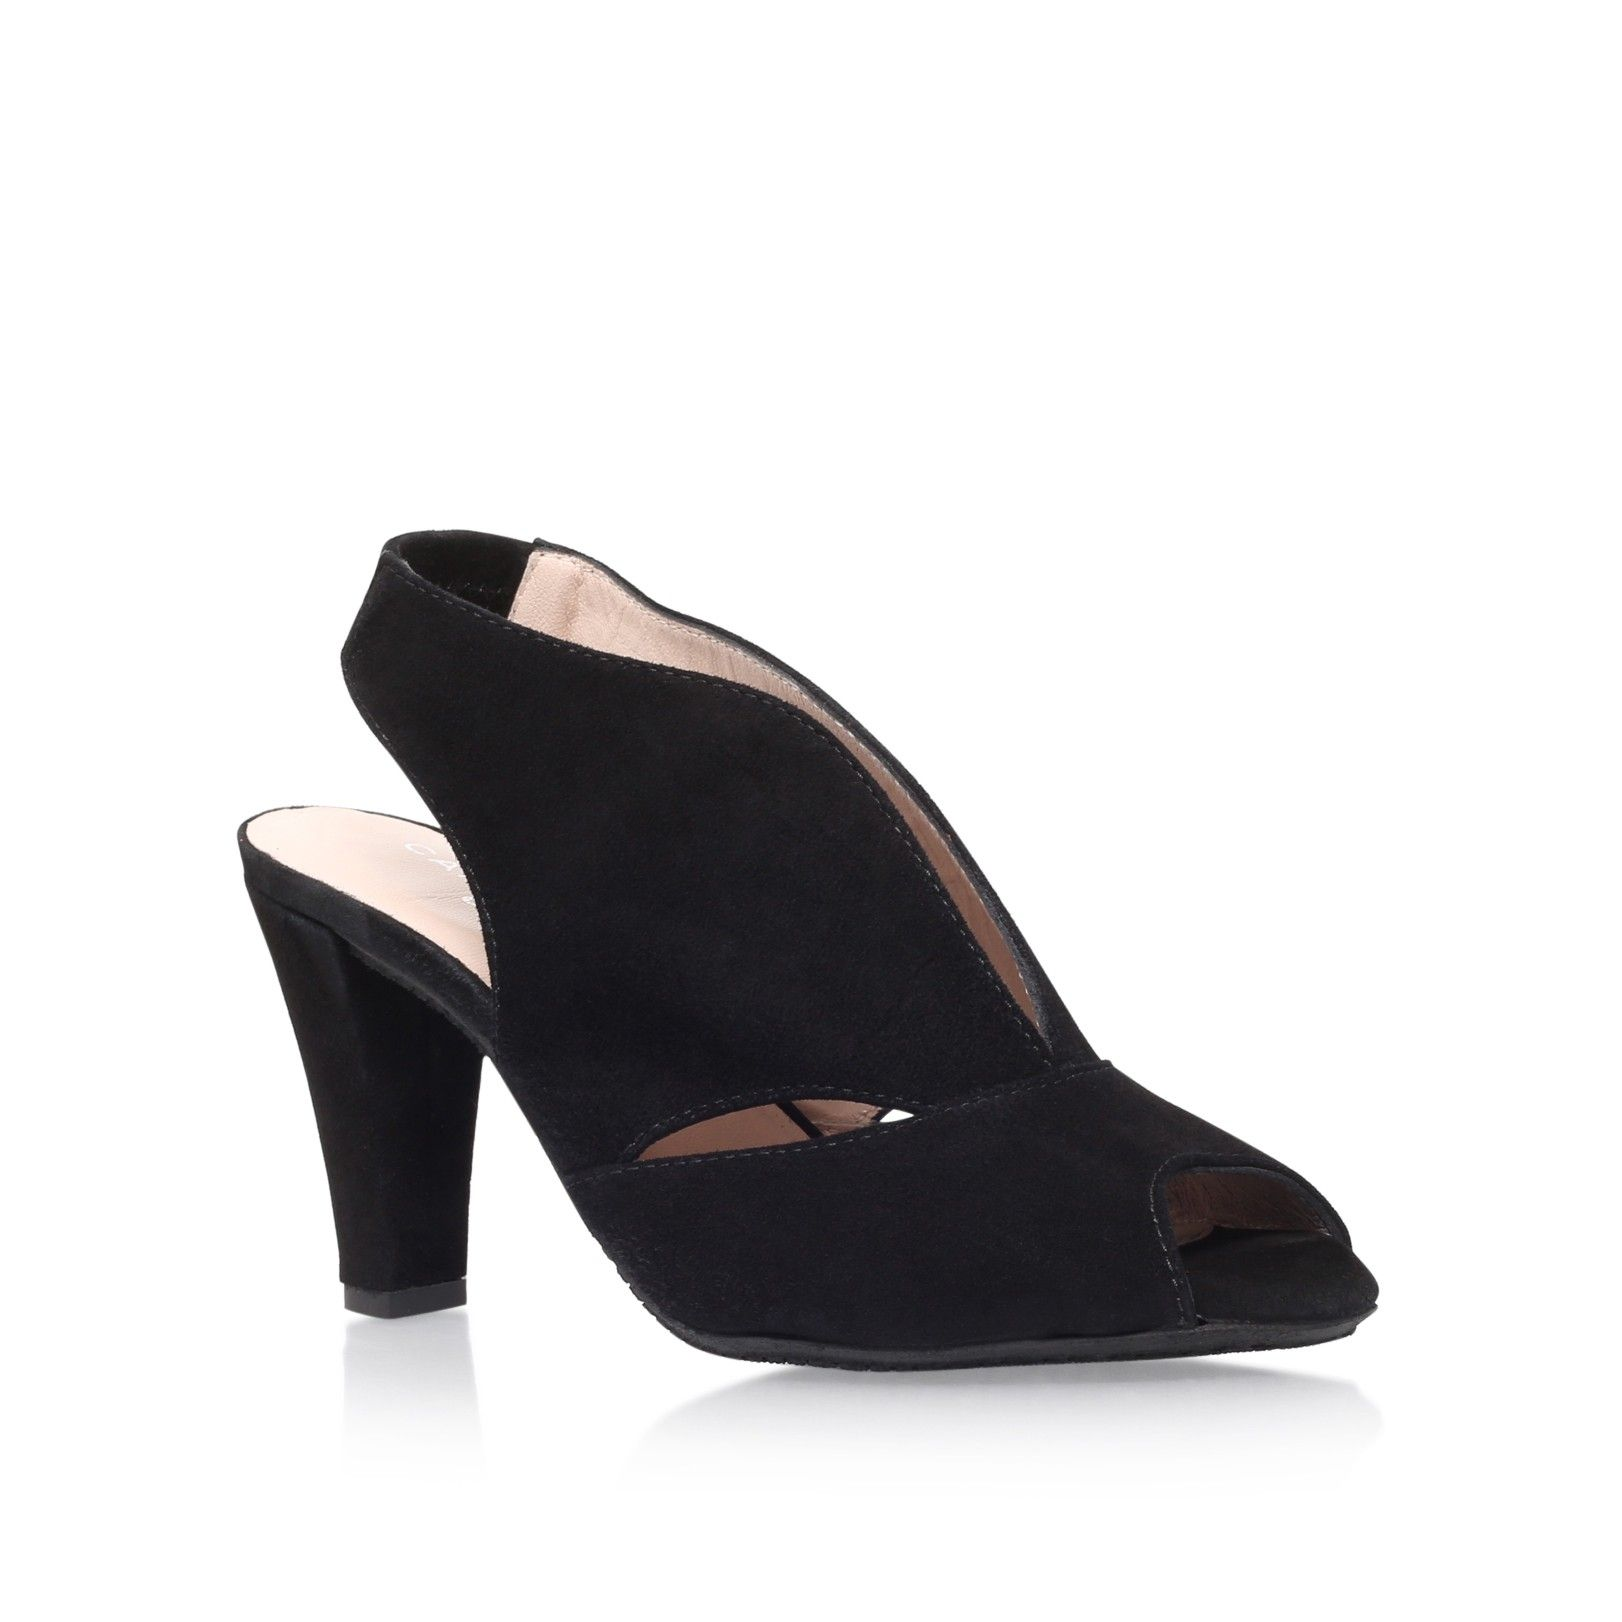 20463b9b299 arabella black mid heel sandals from Carvela Comfort